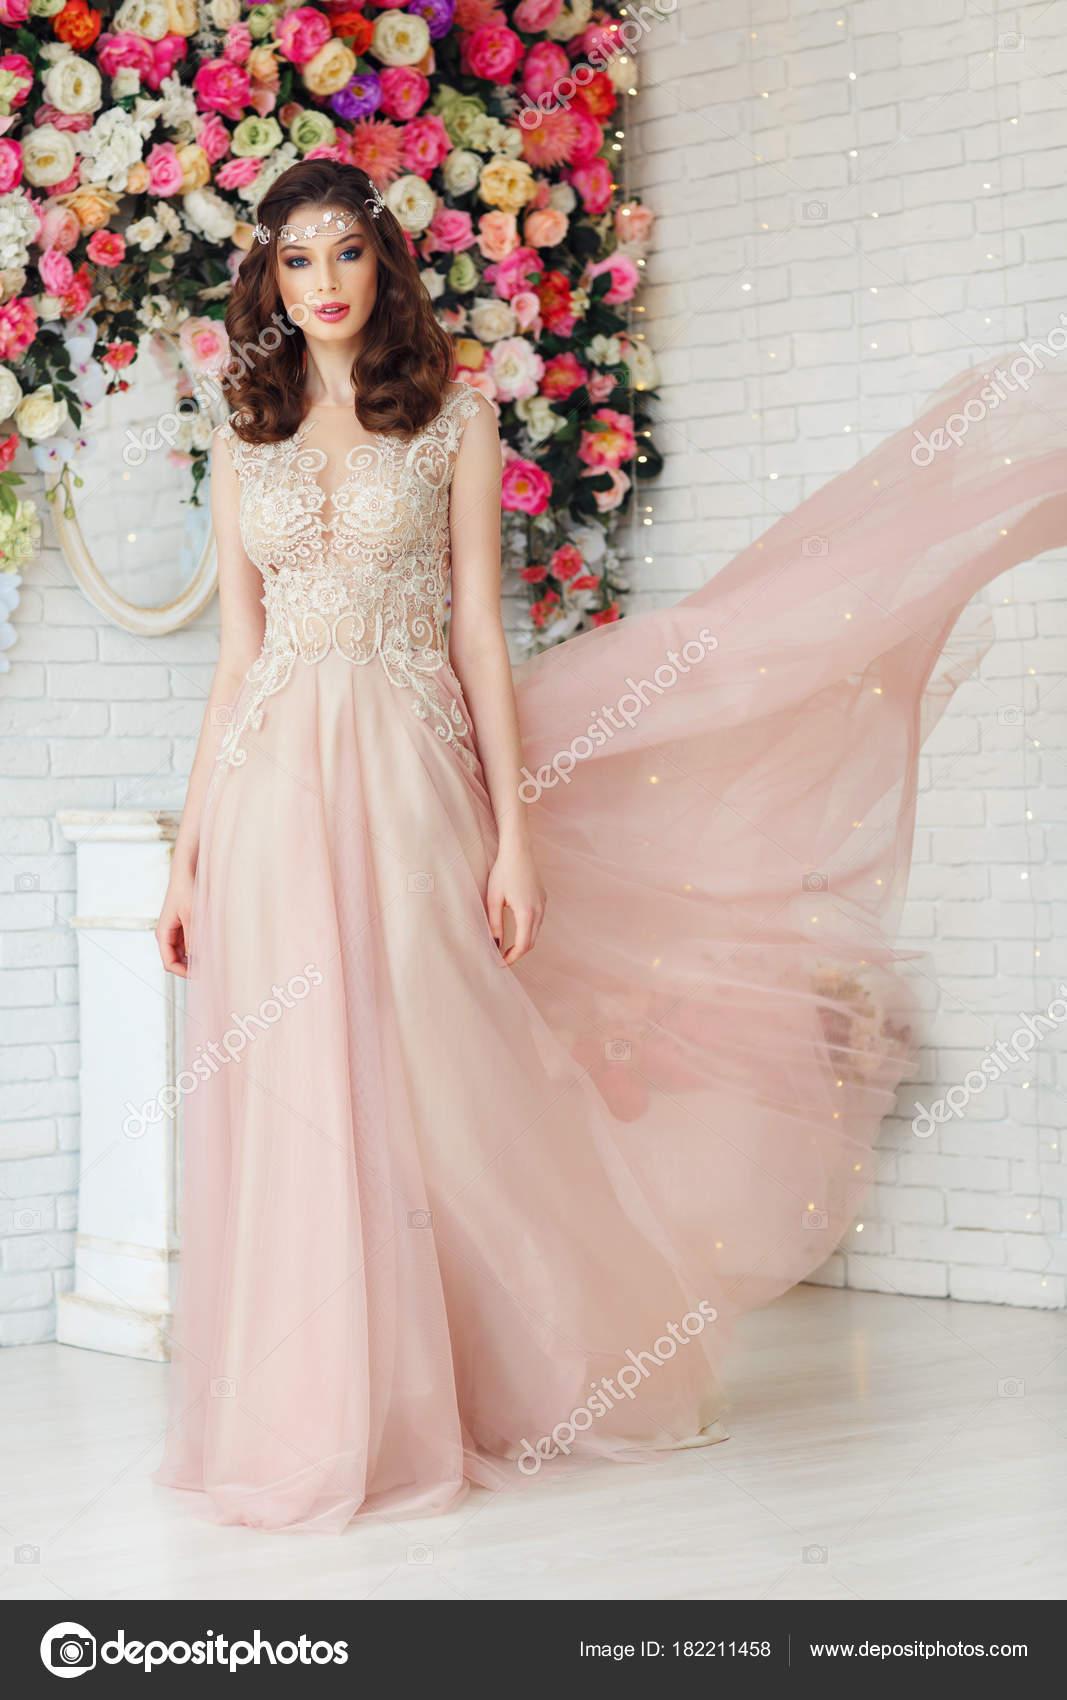 Hermosa Mujer Joven Con Pelo Rizado Encaje Elegante Vestido Posando ...